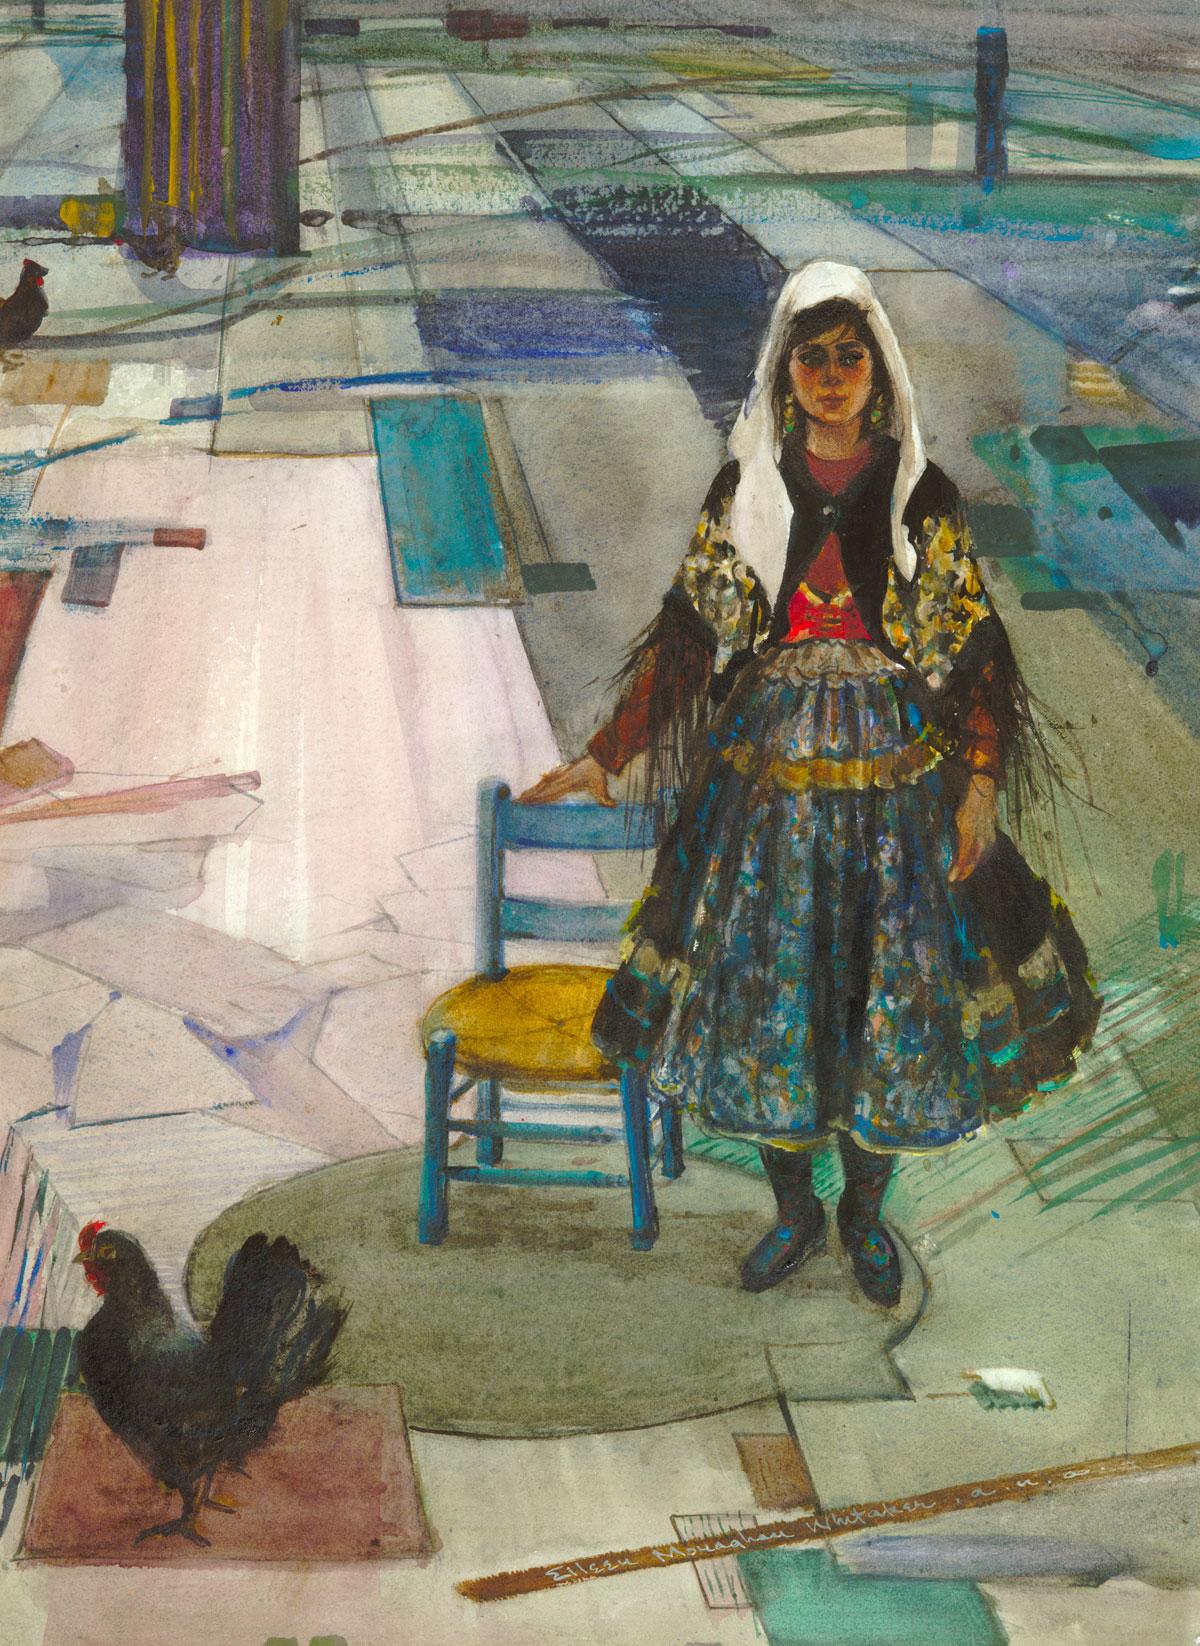 """Lagarterana #3"" 1971 © Eileen Monaghan Whitaker 22x16 inches Watercolor"